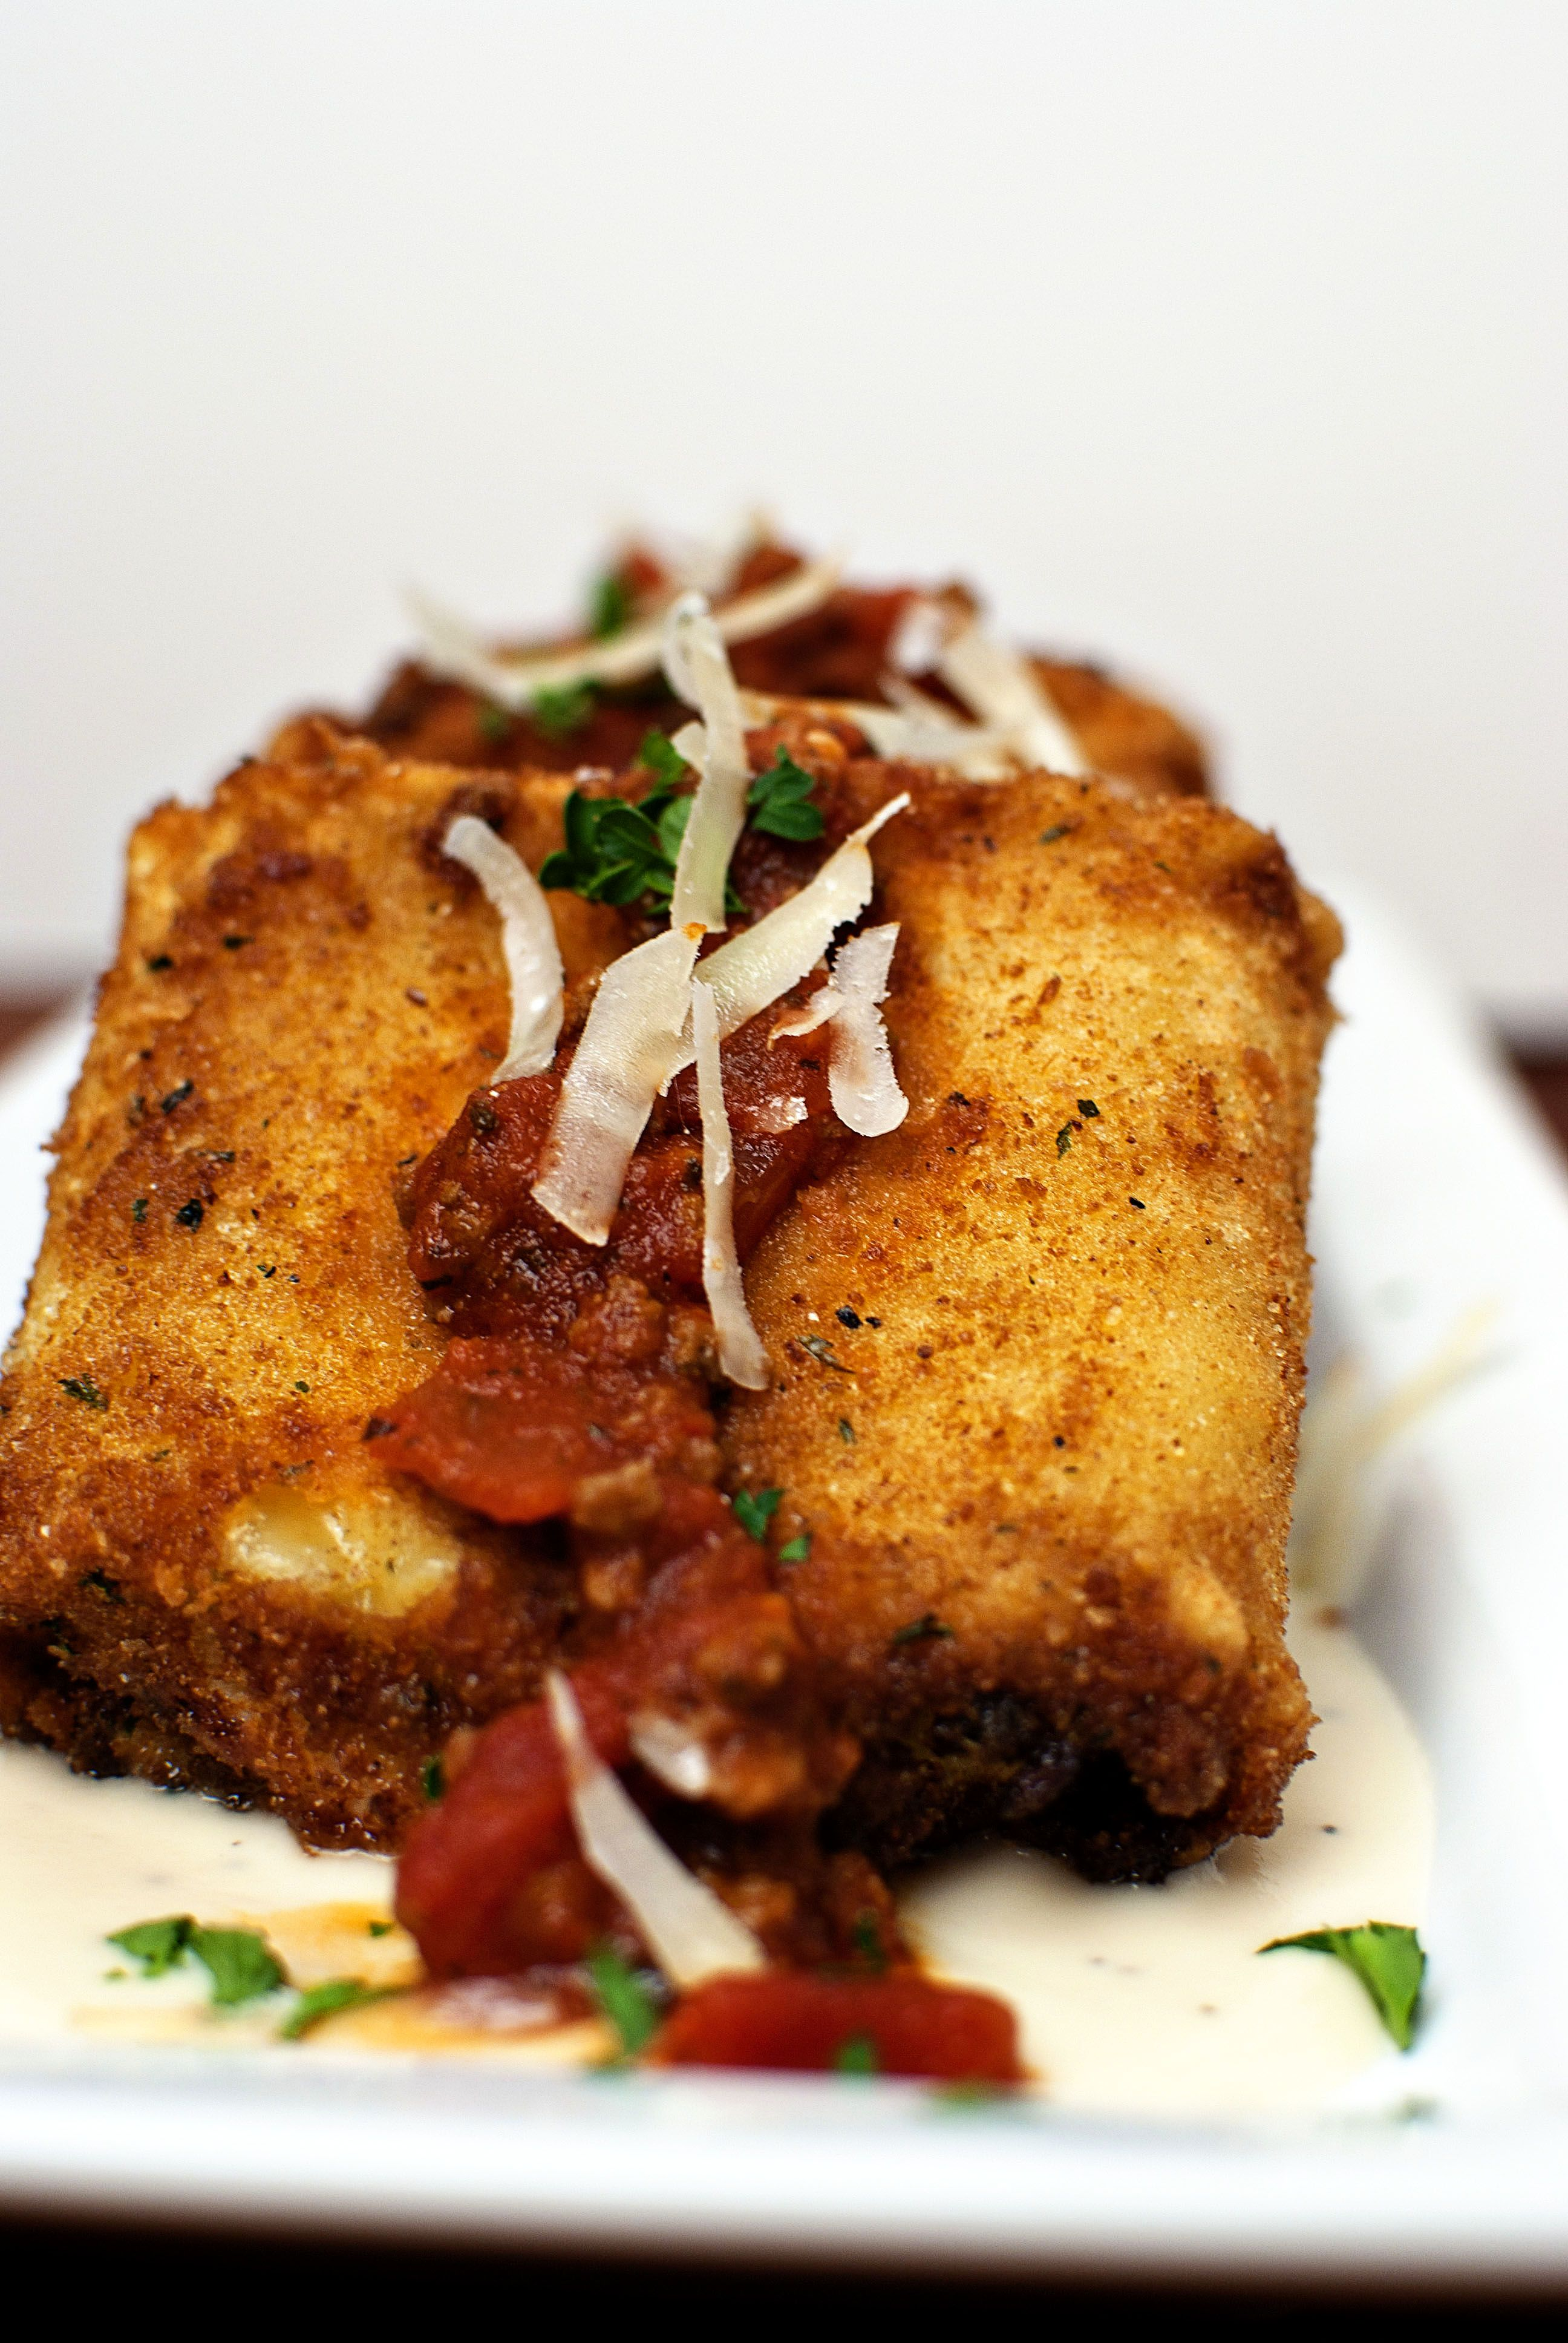 lasagna fritta deep fried lasagna olive garden copy cat recipe - Olive Garden Lasagna Recipe